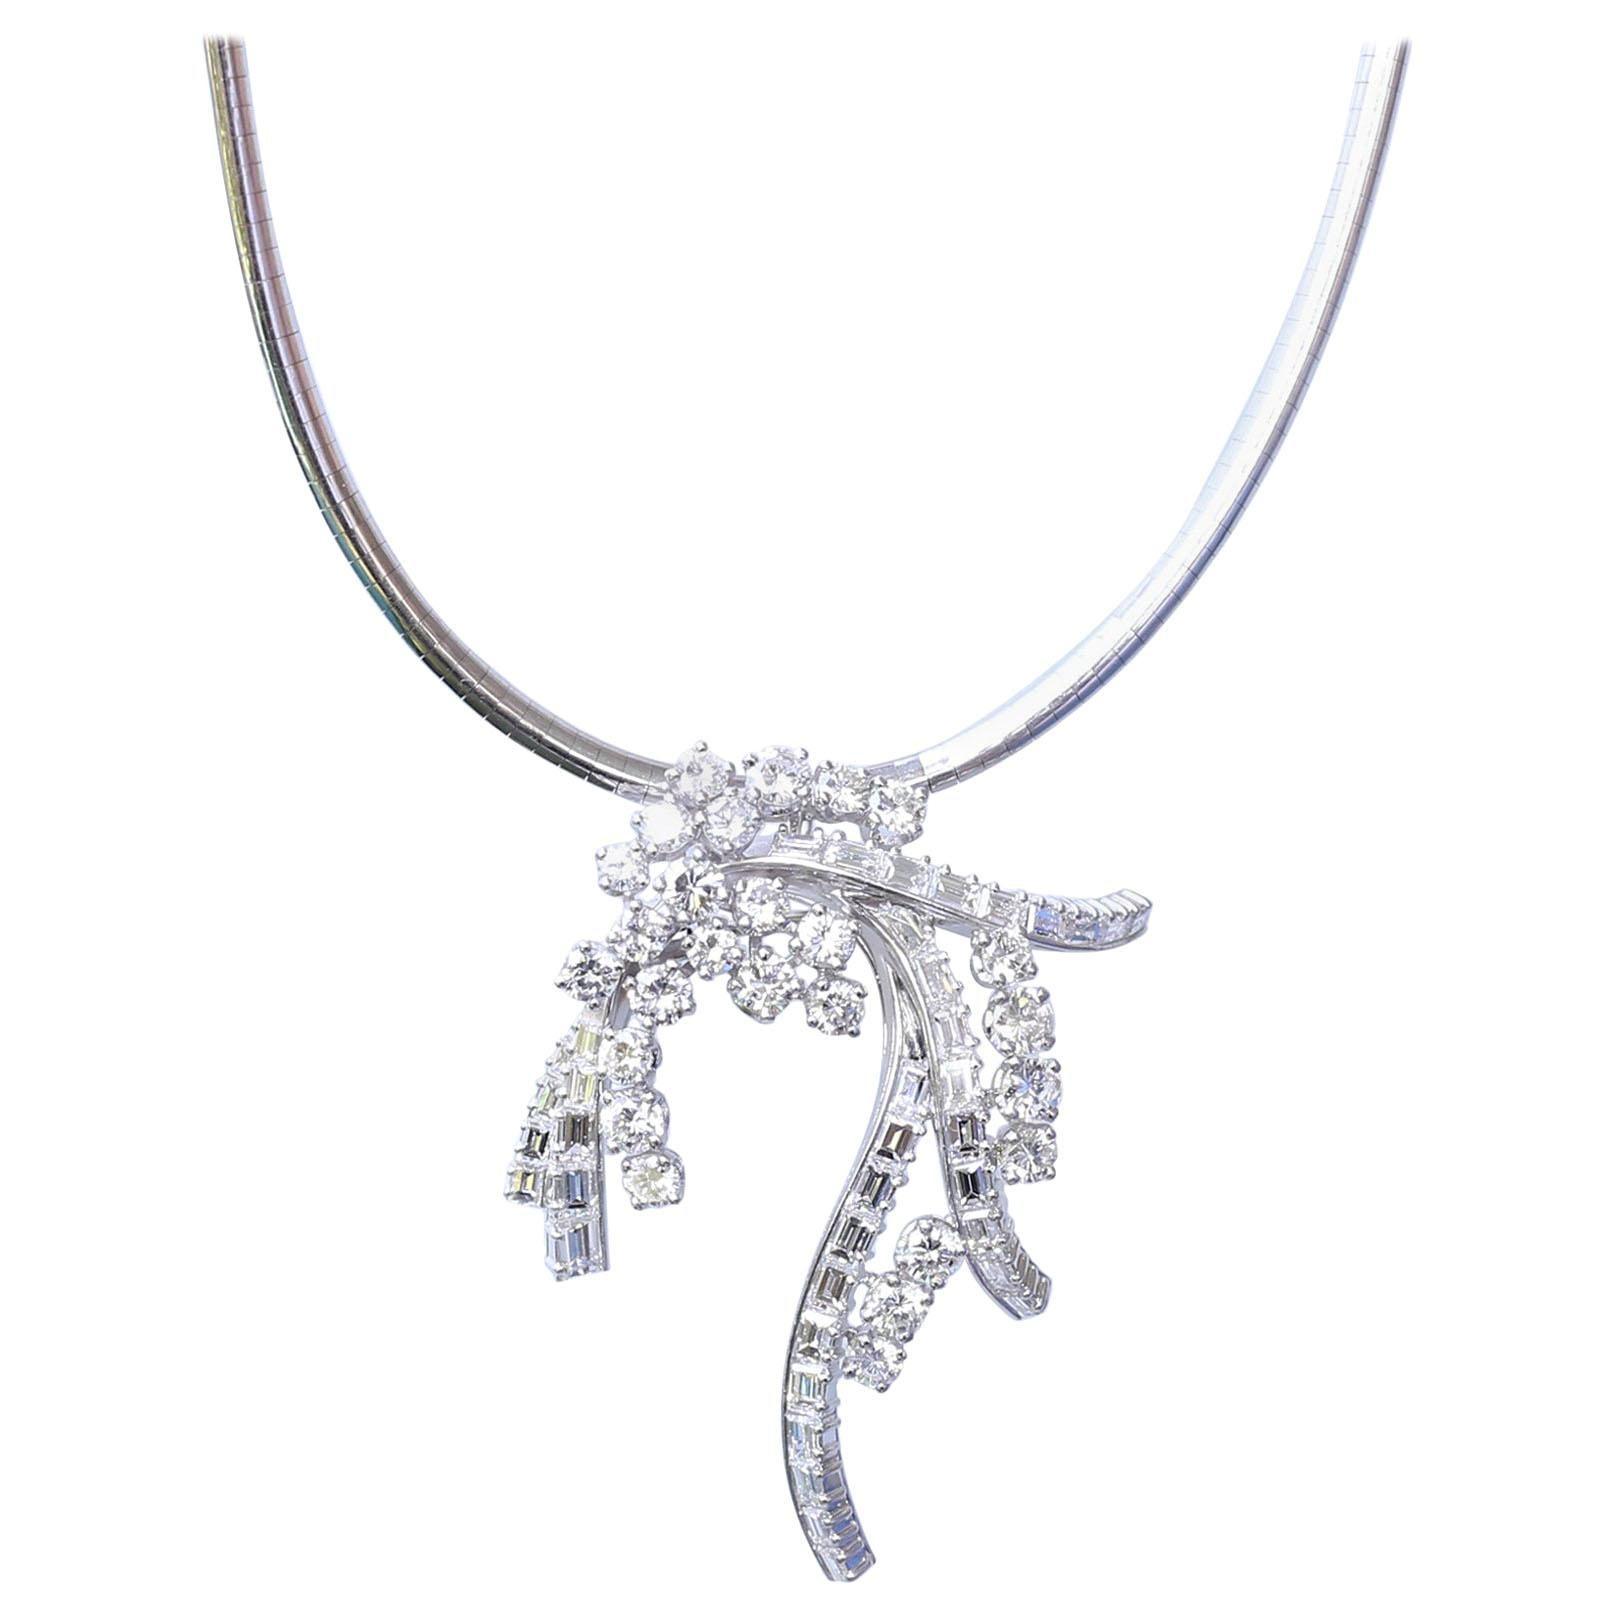 Diamonds Pendant Cord Brooch Pin 18k White Gold, 1970